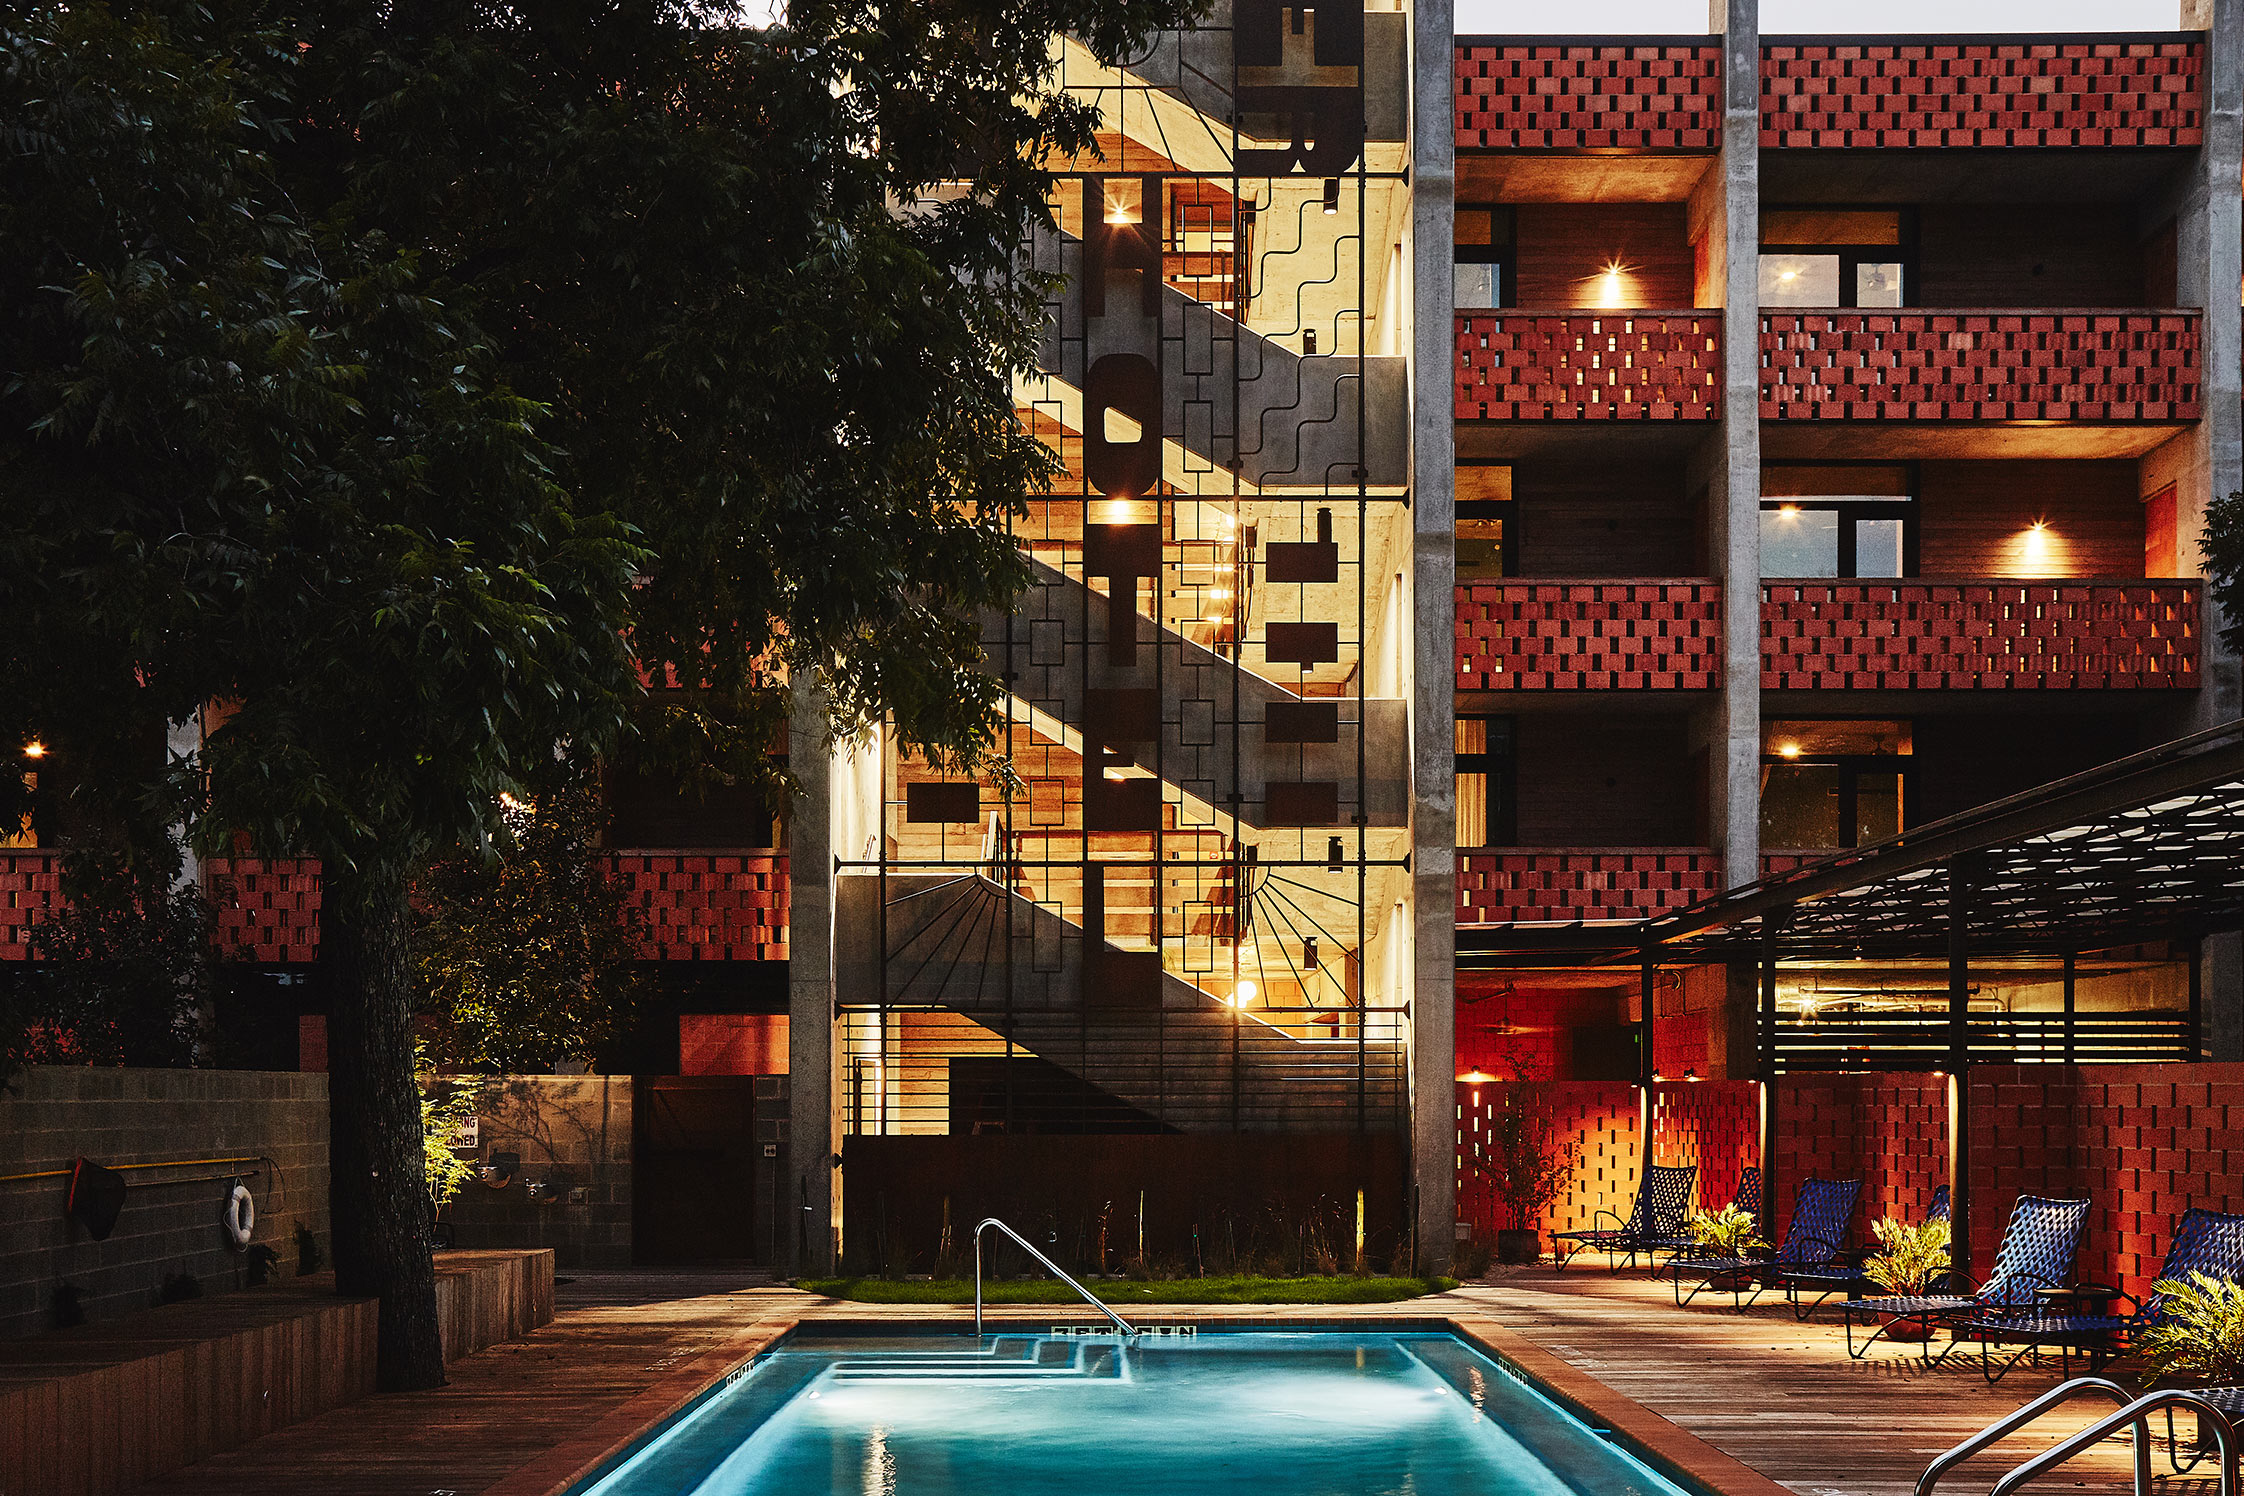 THE_CARPENTER_HOTEL_WEEKEND_AUSTIN_TEXAS12.jpg